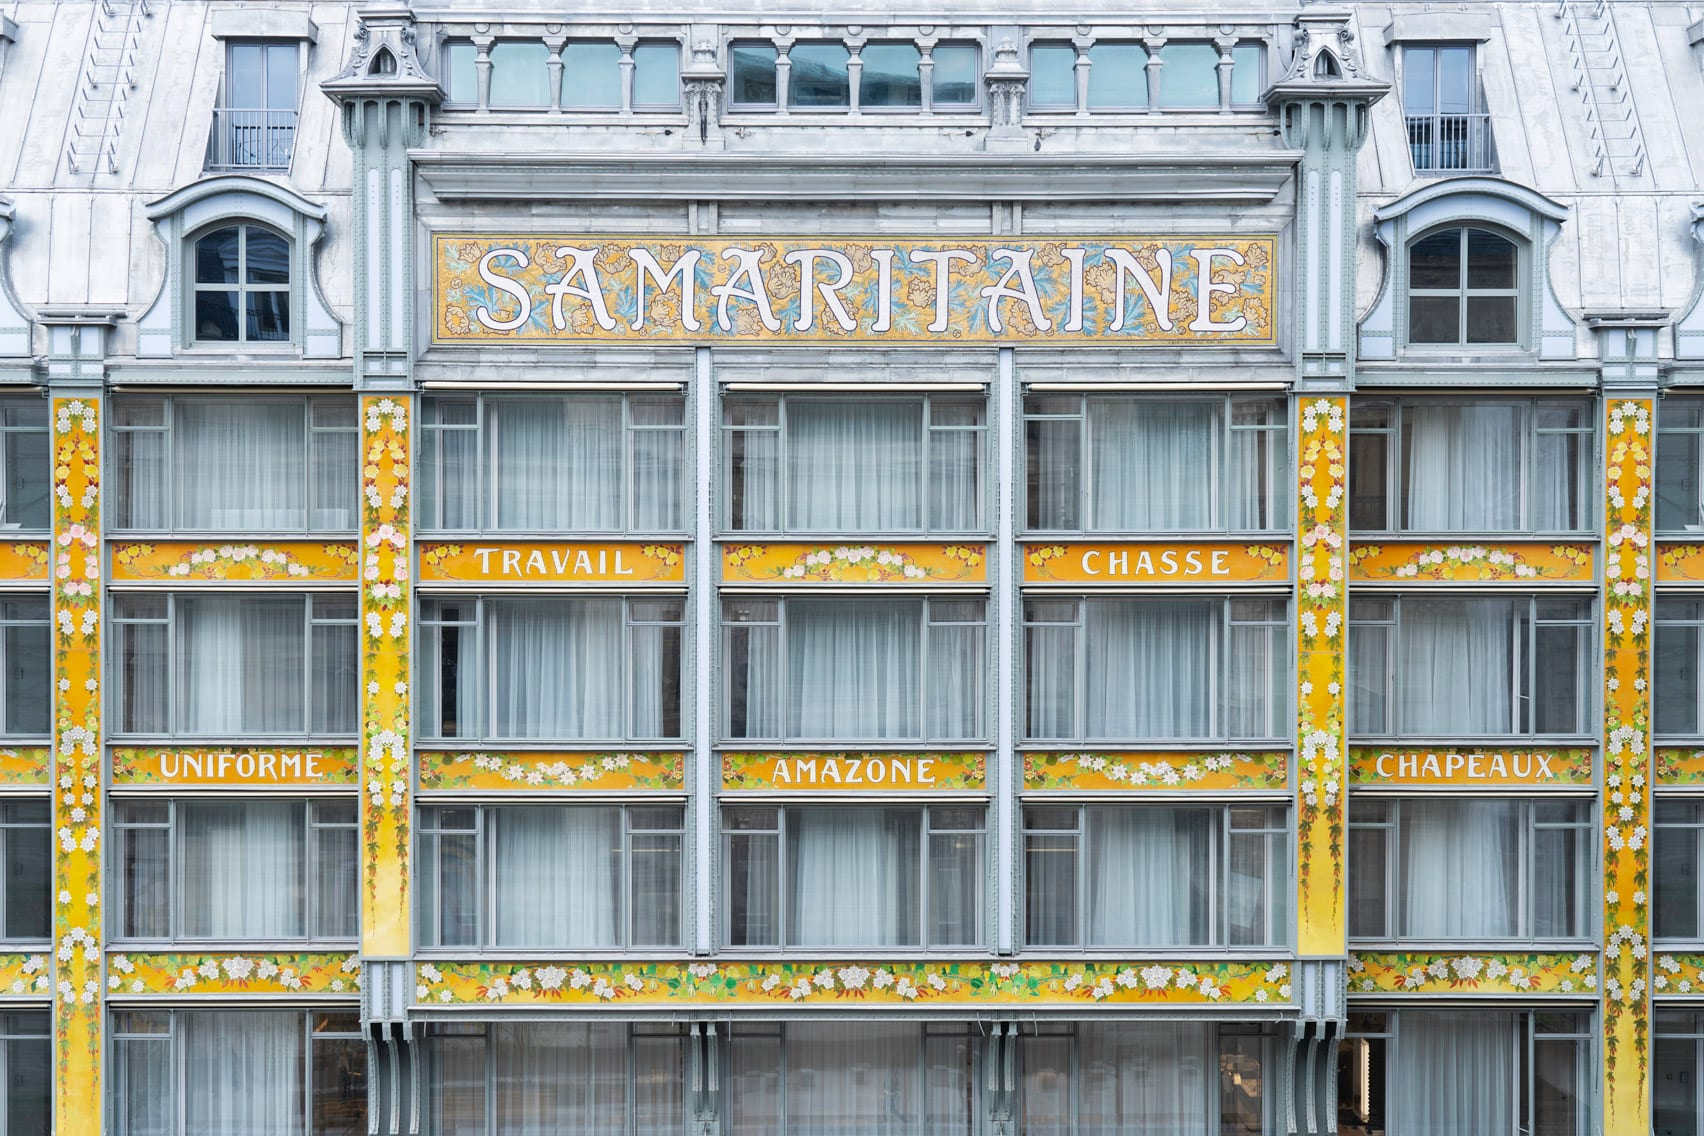 La Samaritaine art deco facade